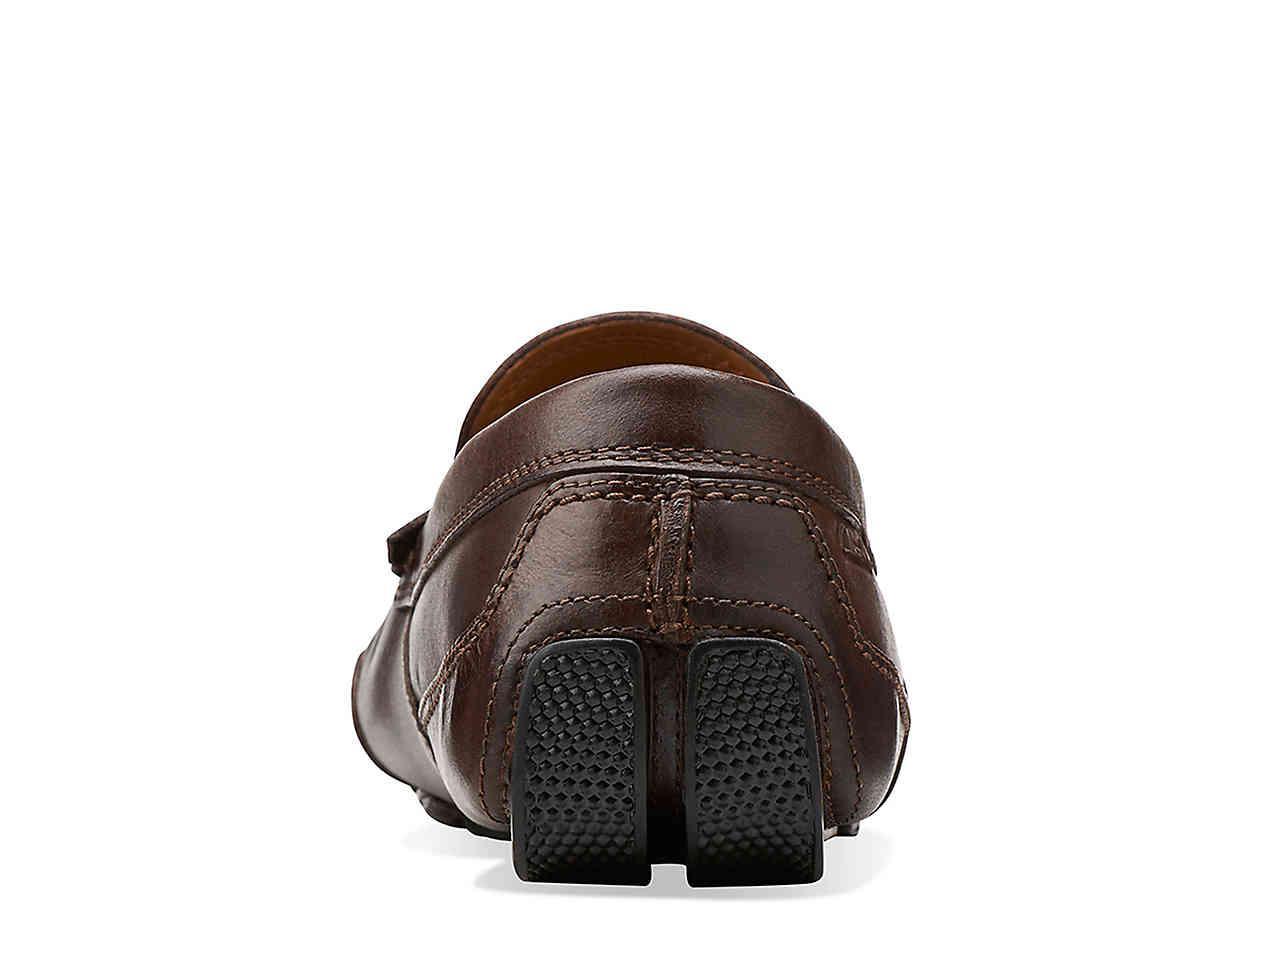 Clarks Denim Ashton Way Loafer in Brown